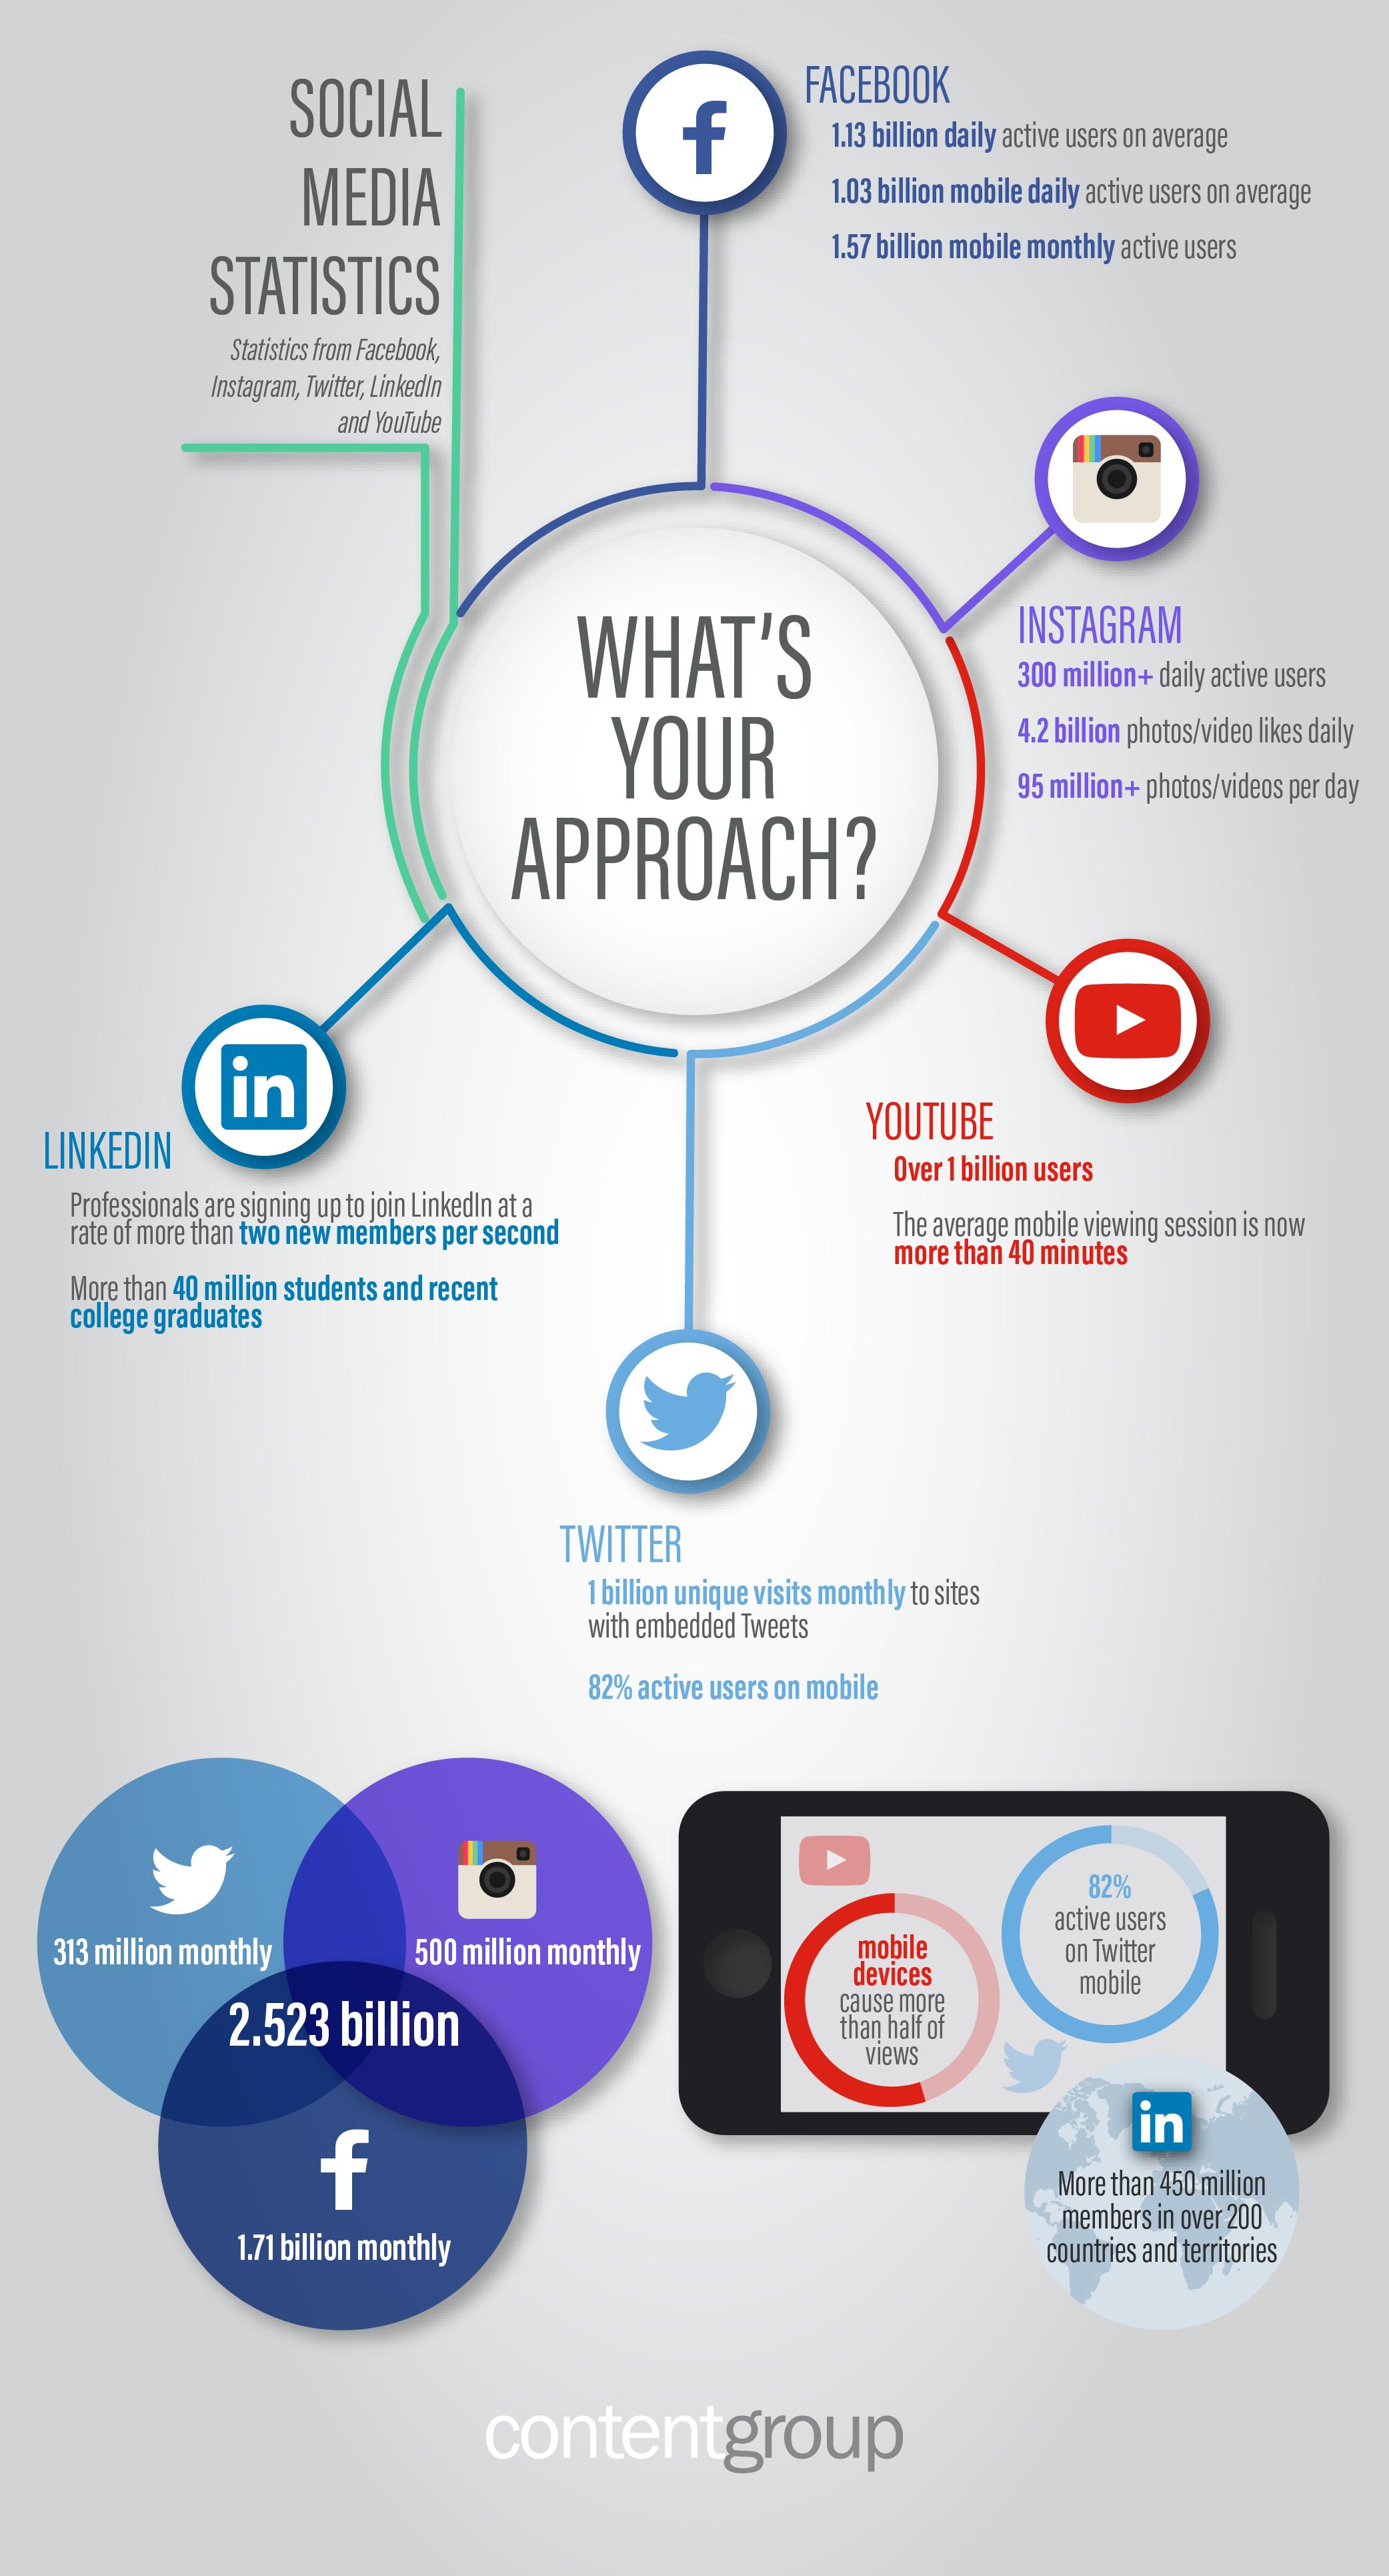 20161025-social-media-infographic-01